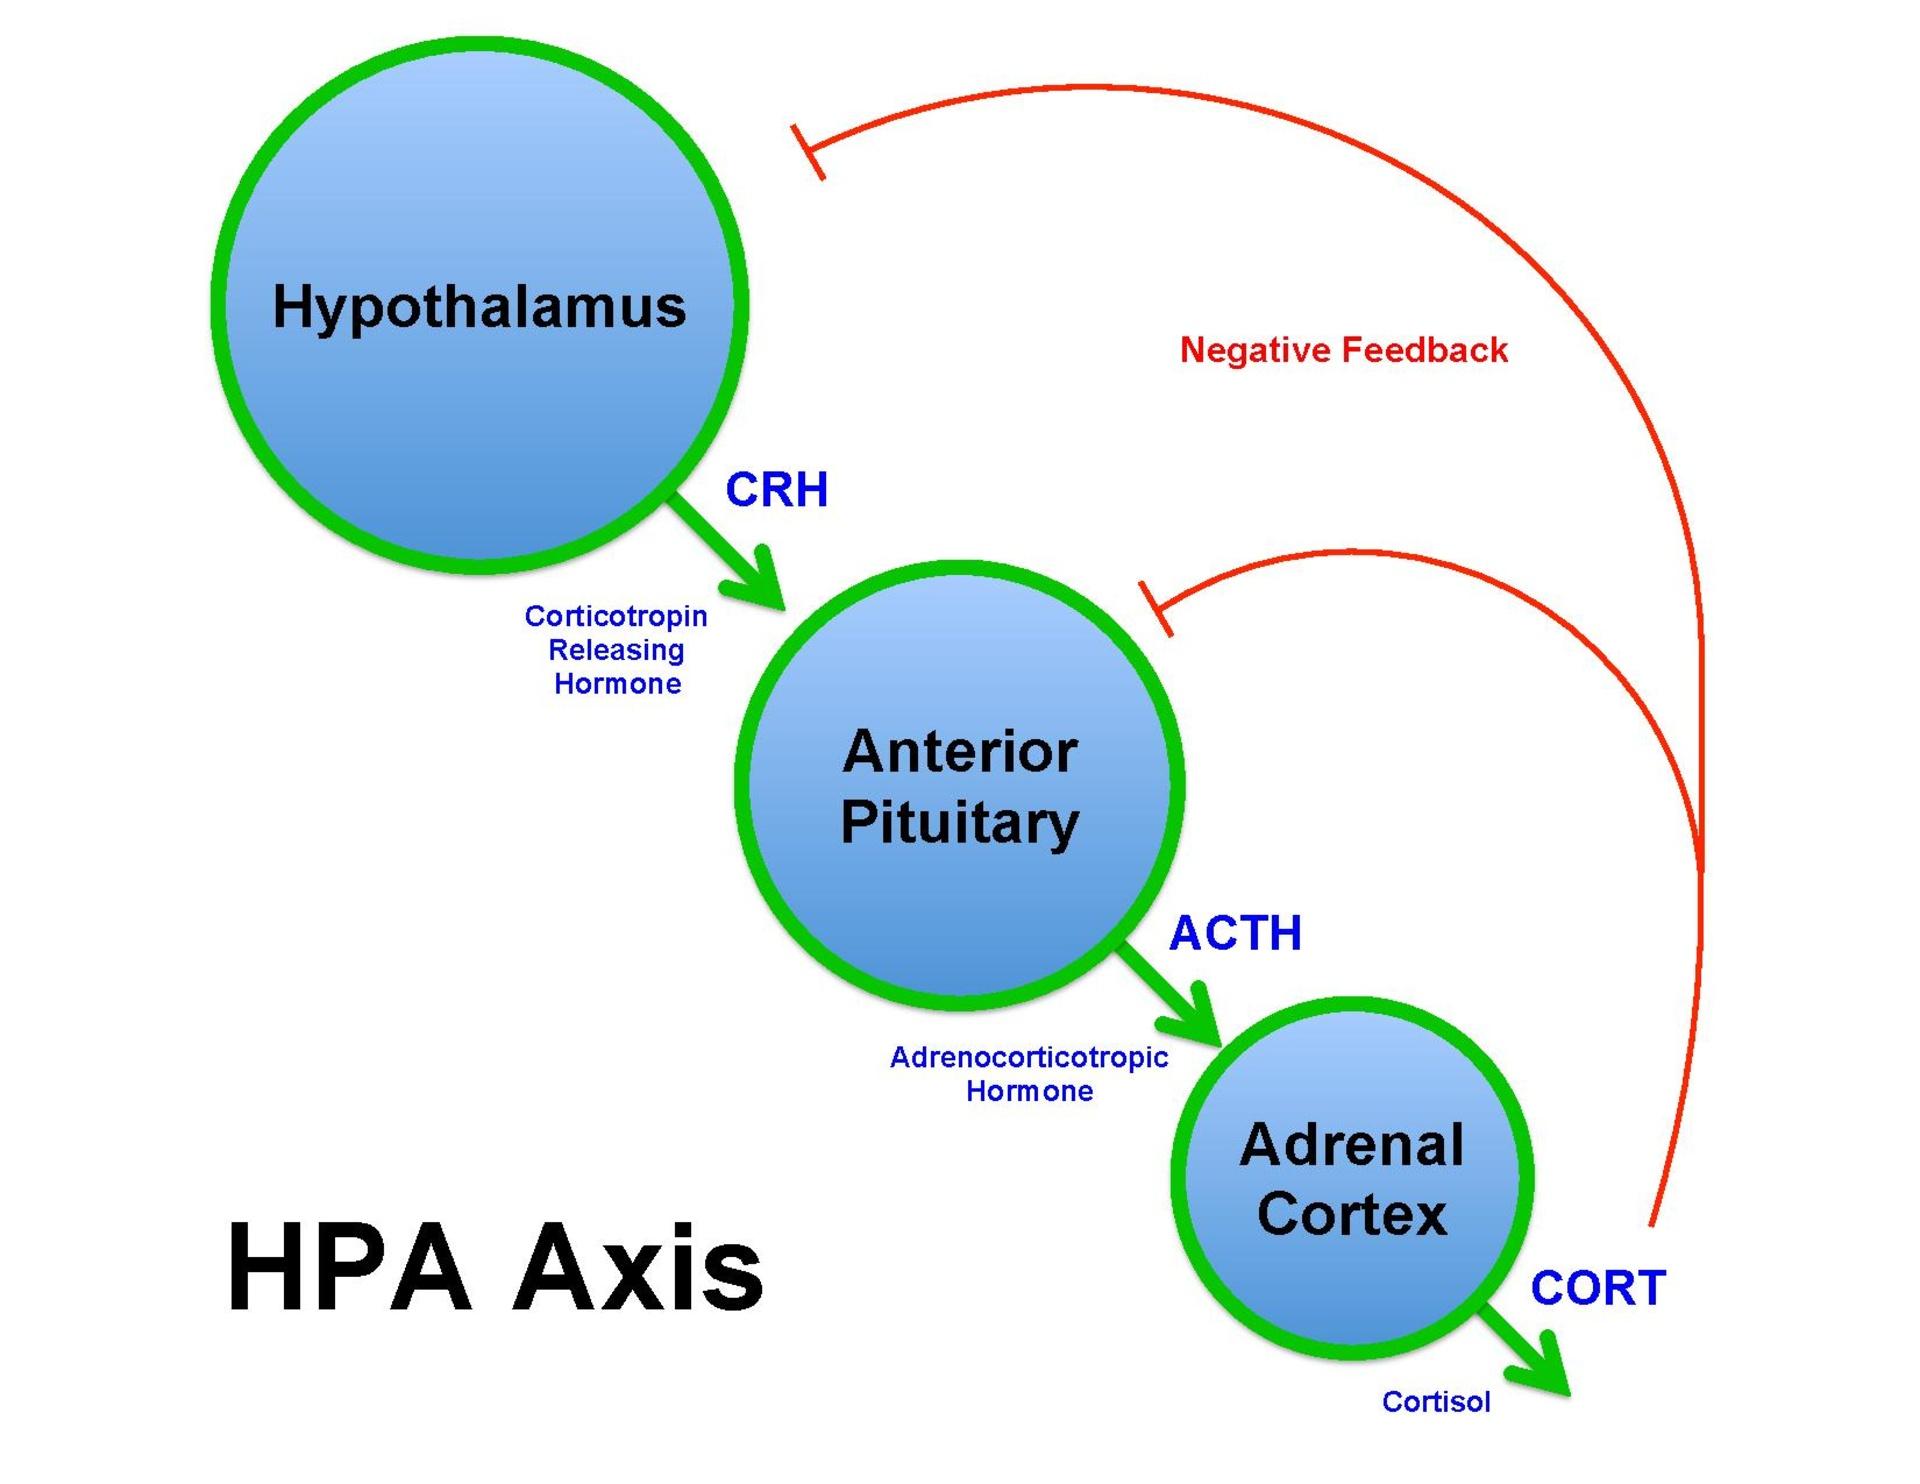 page1-1920px-Brian_M_Sweis_HPA_Axis_Diagram_2012.pdf.jpg